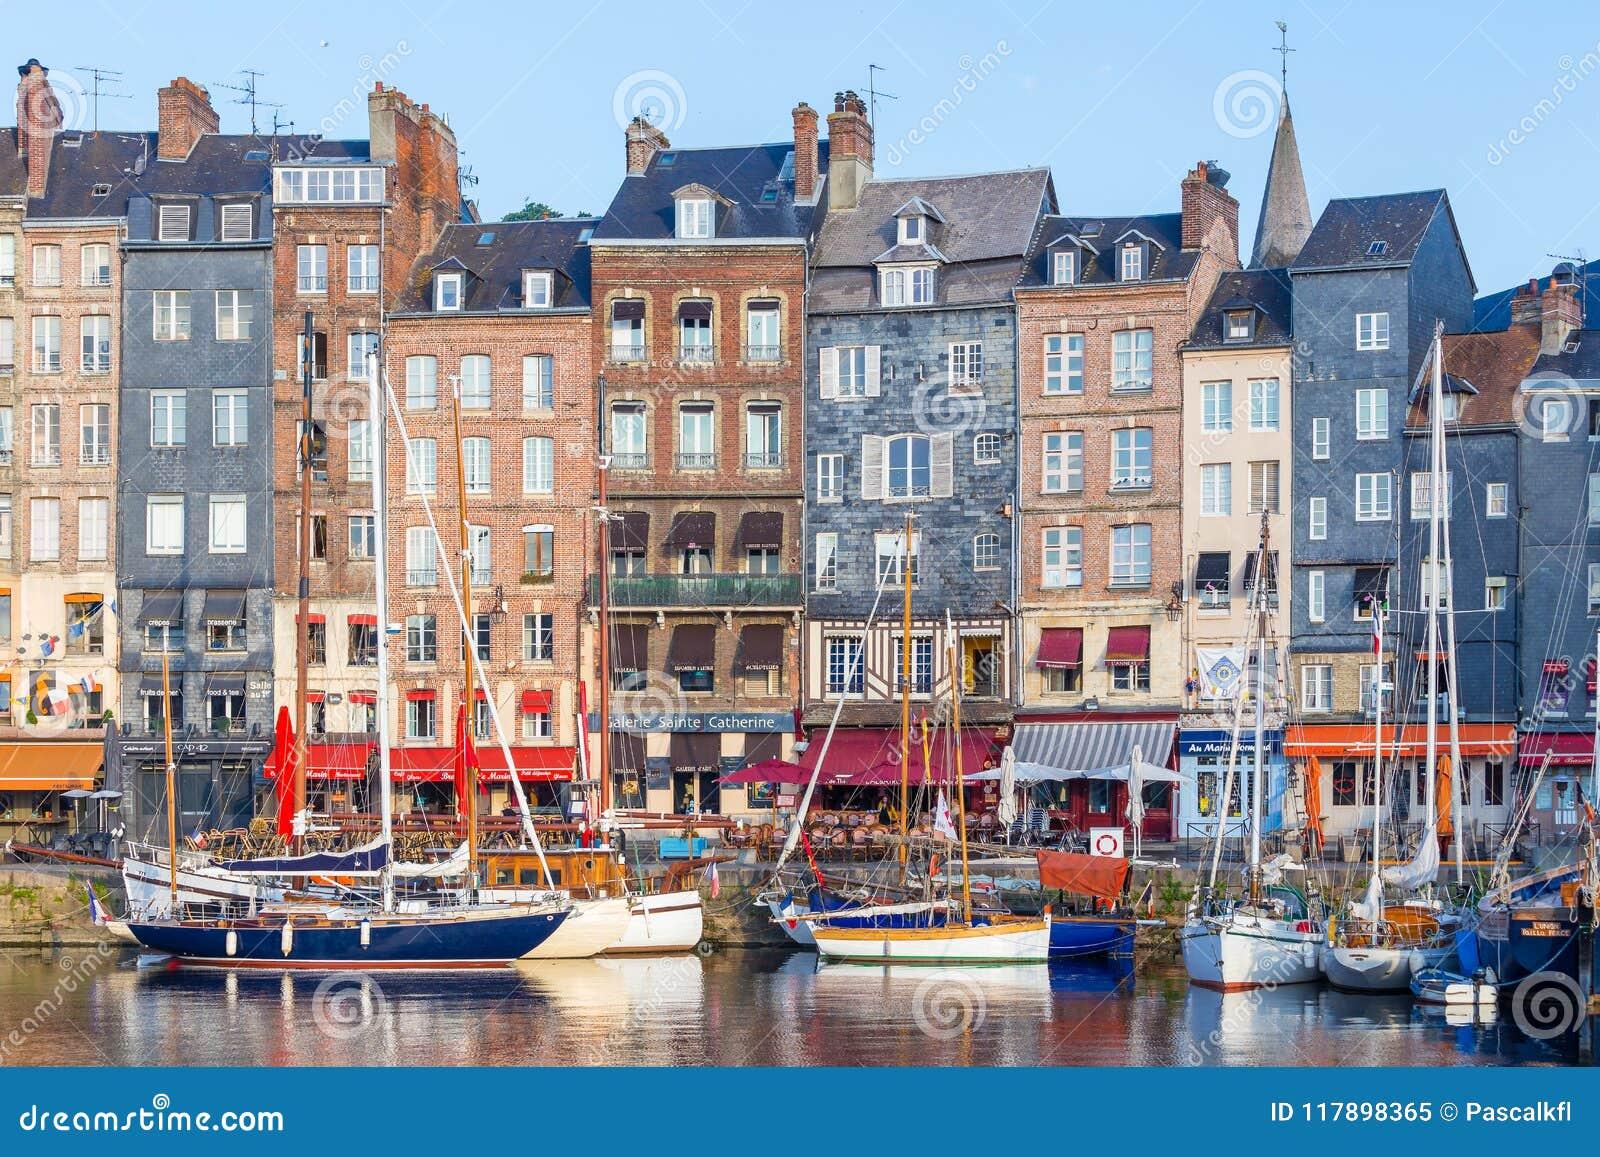 Honfleur Frankrike - Augusti 31, 2016: Pittoresk gammal hamn på den Normandie byn av Honfleur Frankrike med fartyg och kaféer